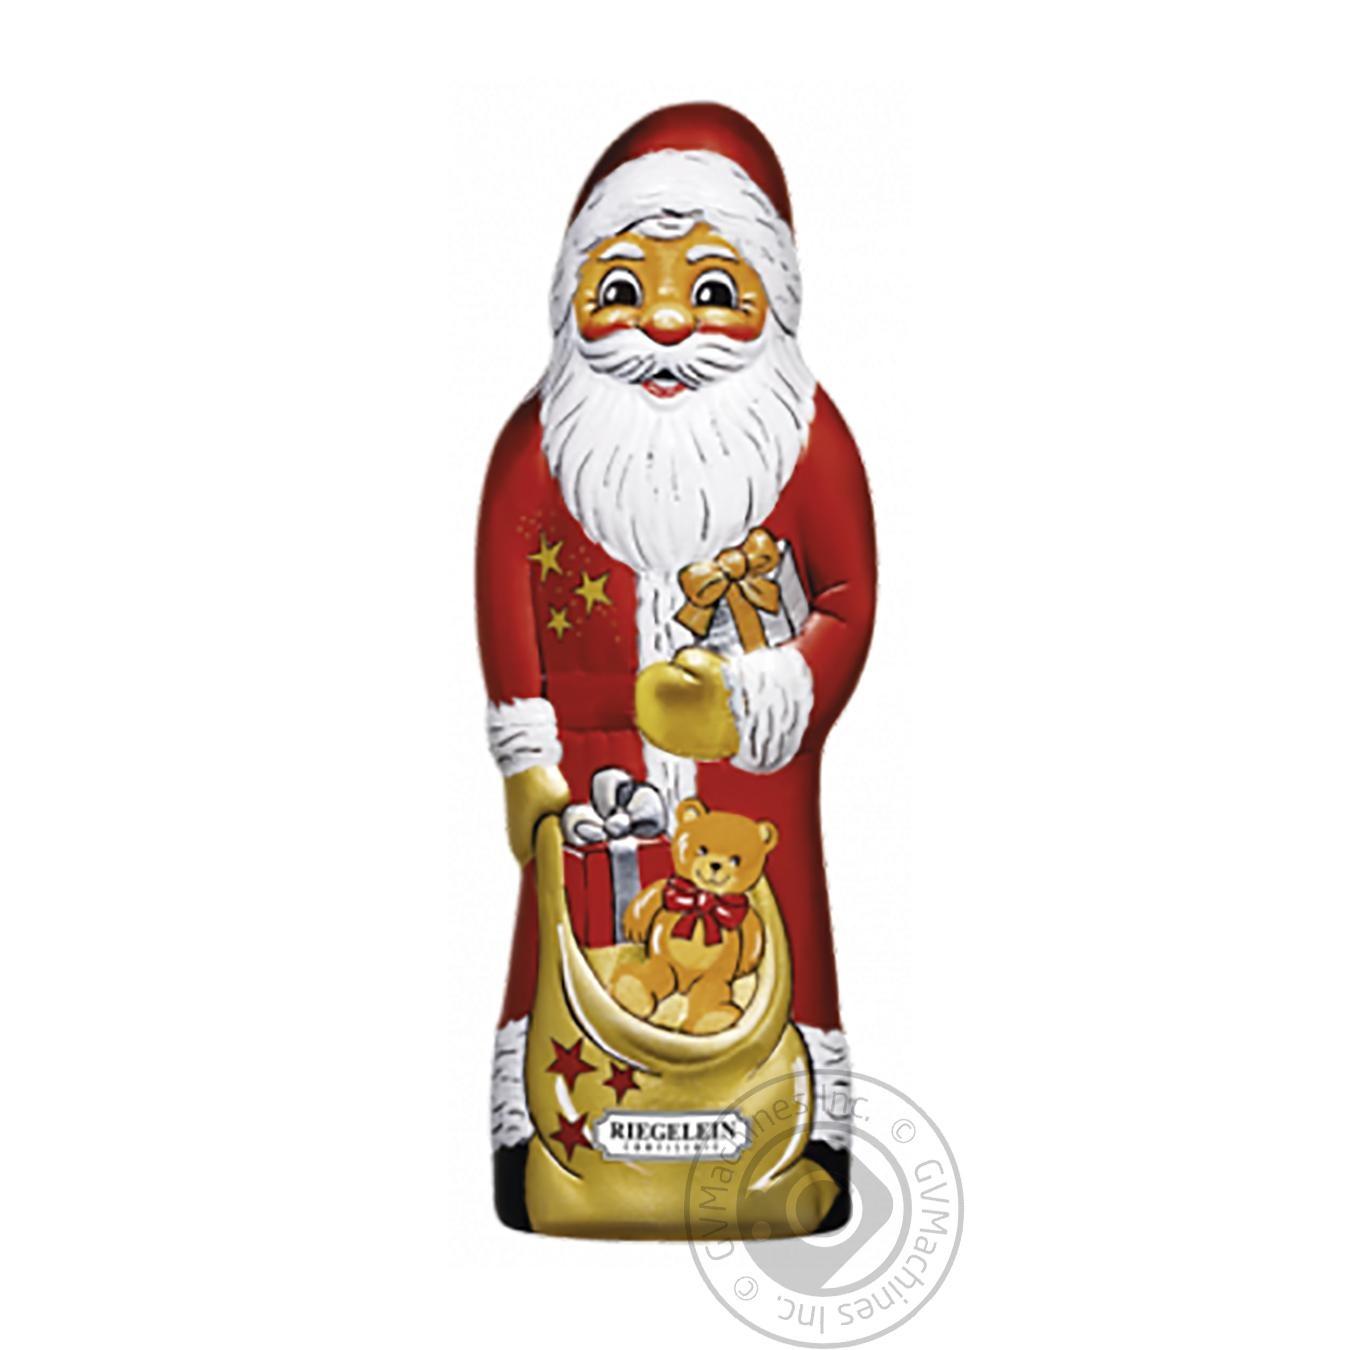 Купить Фігурка шоколадна Riegelein Санта-Клаус 150г